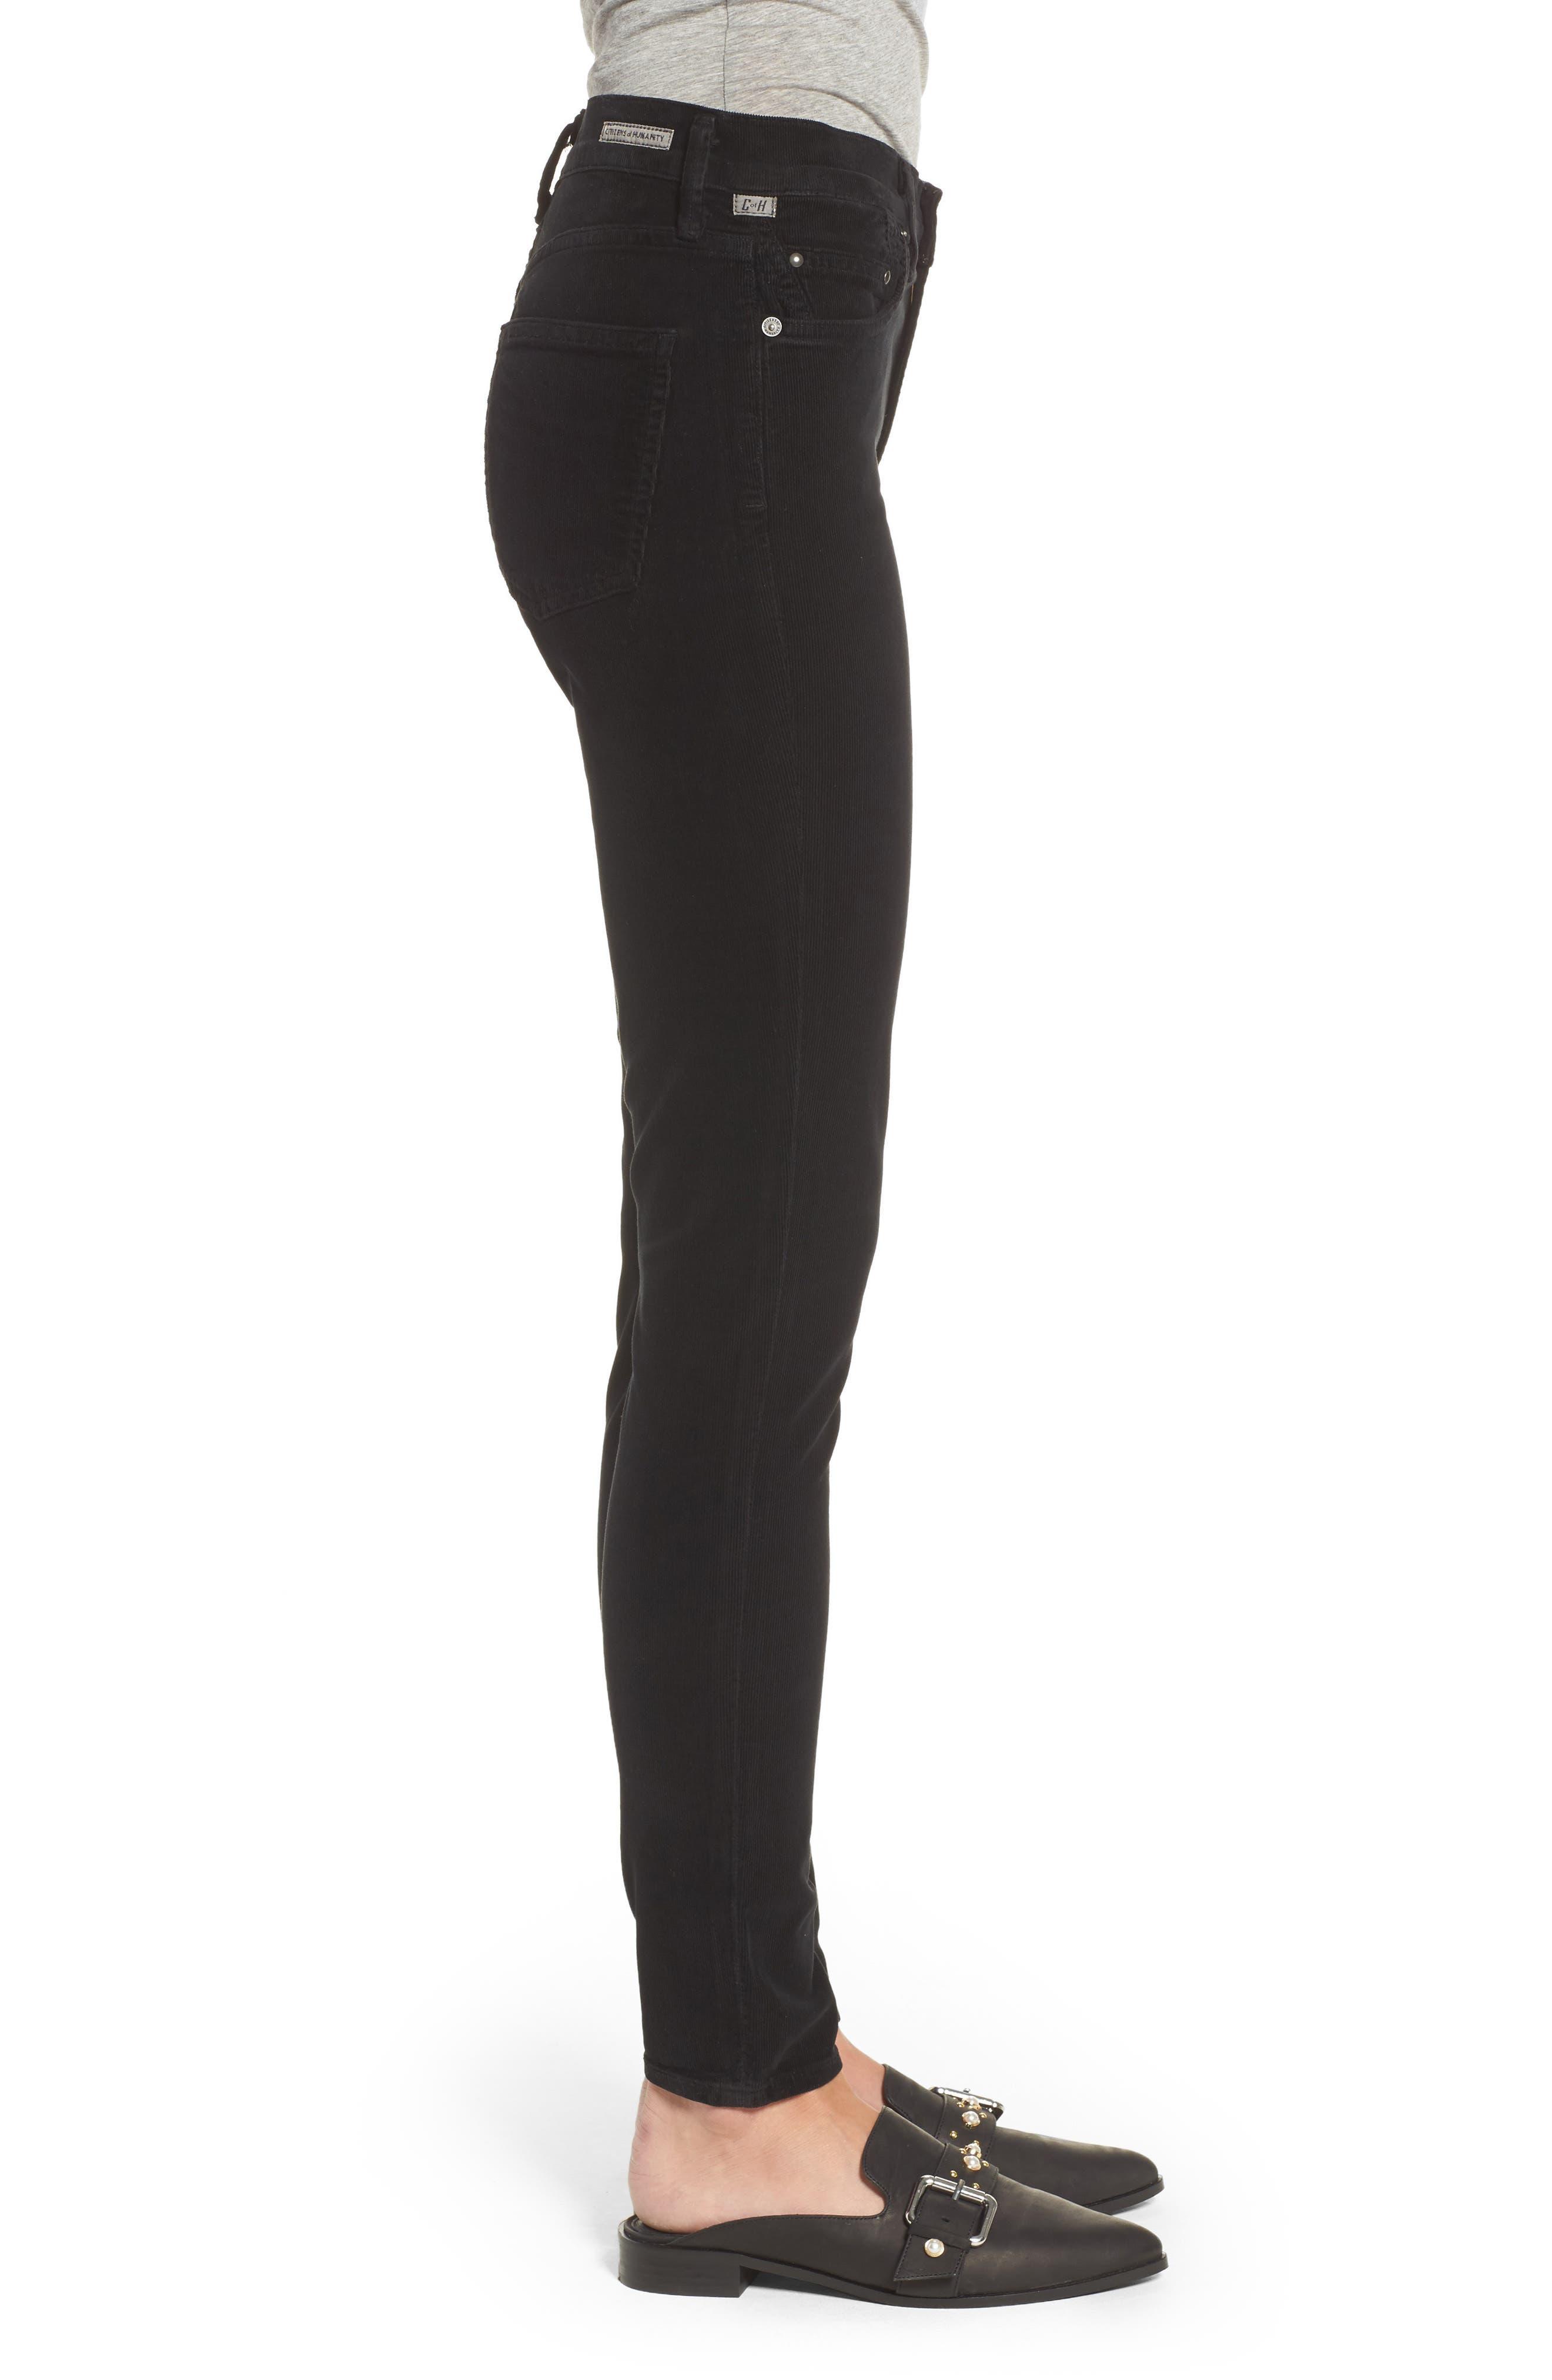 Rocket High Waist Skinny Corduroy Pants,                             Alternate thumbnail 3, color,                             006